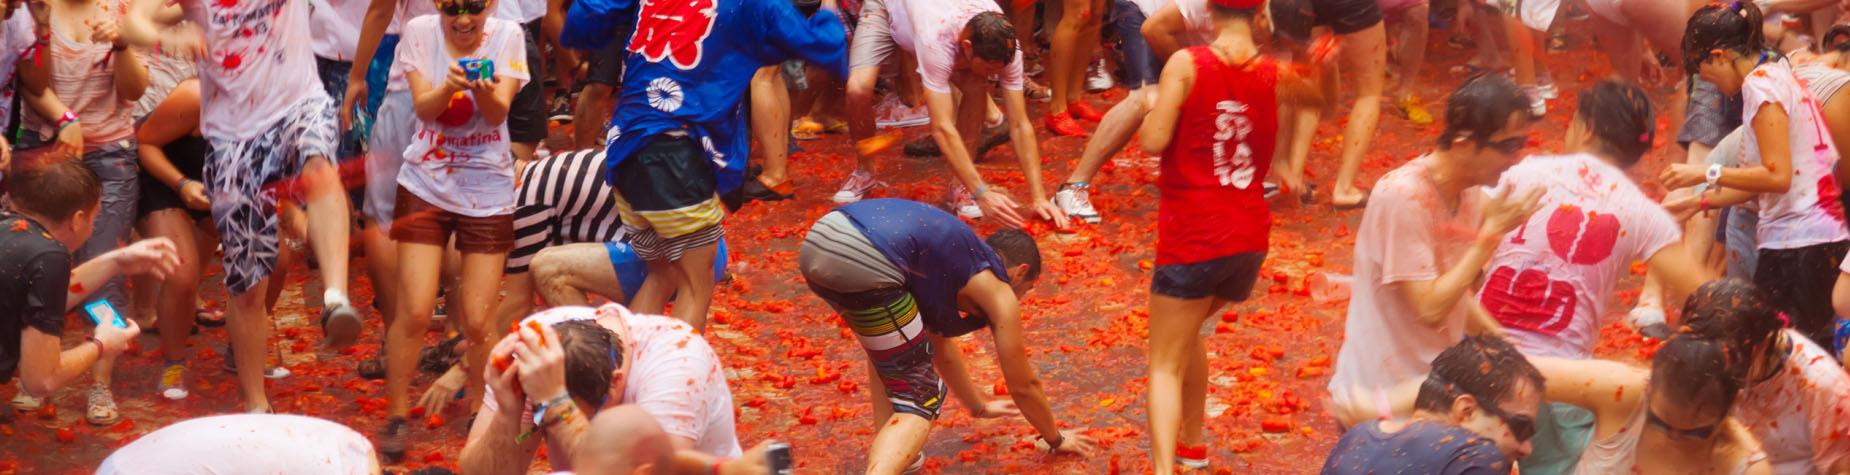 Gooi er op los tijdens het La Tomatina festival